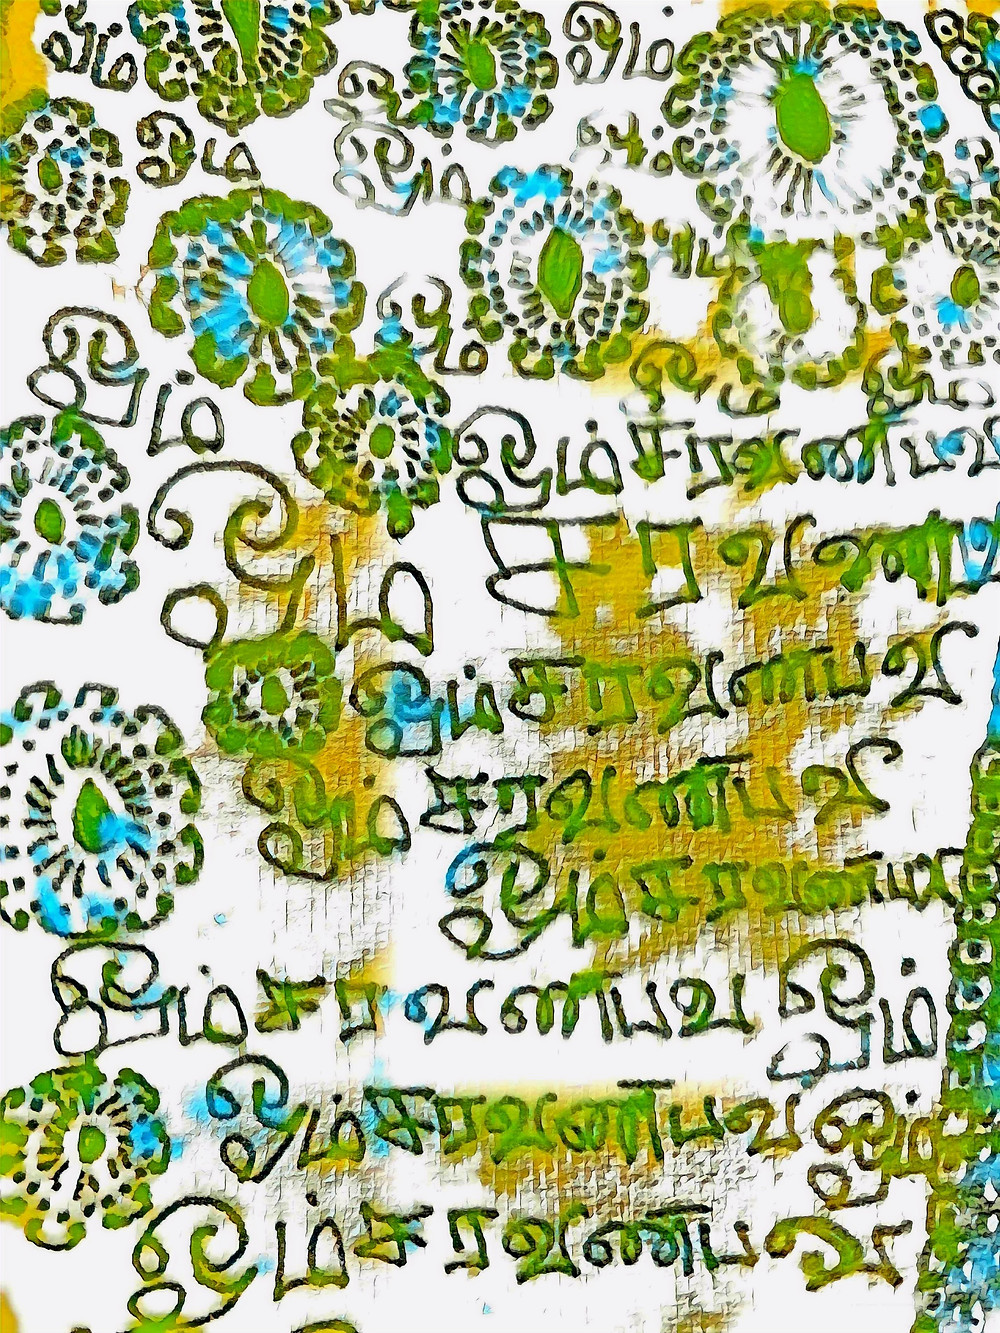 Divine Art of Neelam Sundaram | Meditate on Sakti, feminine energy, who empowers this form. Meditate on Sakti, feminine energy, who  transcends this form.  Your Guru nearby. Your Guru Beyond. Sakti, feminine energy,  empowers all forms, transcends all forms. | Aum Sundaram Aumkaar Sundaram